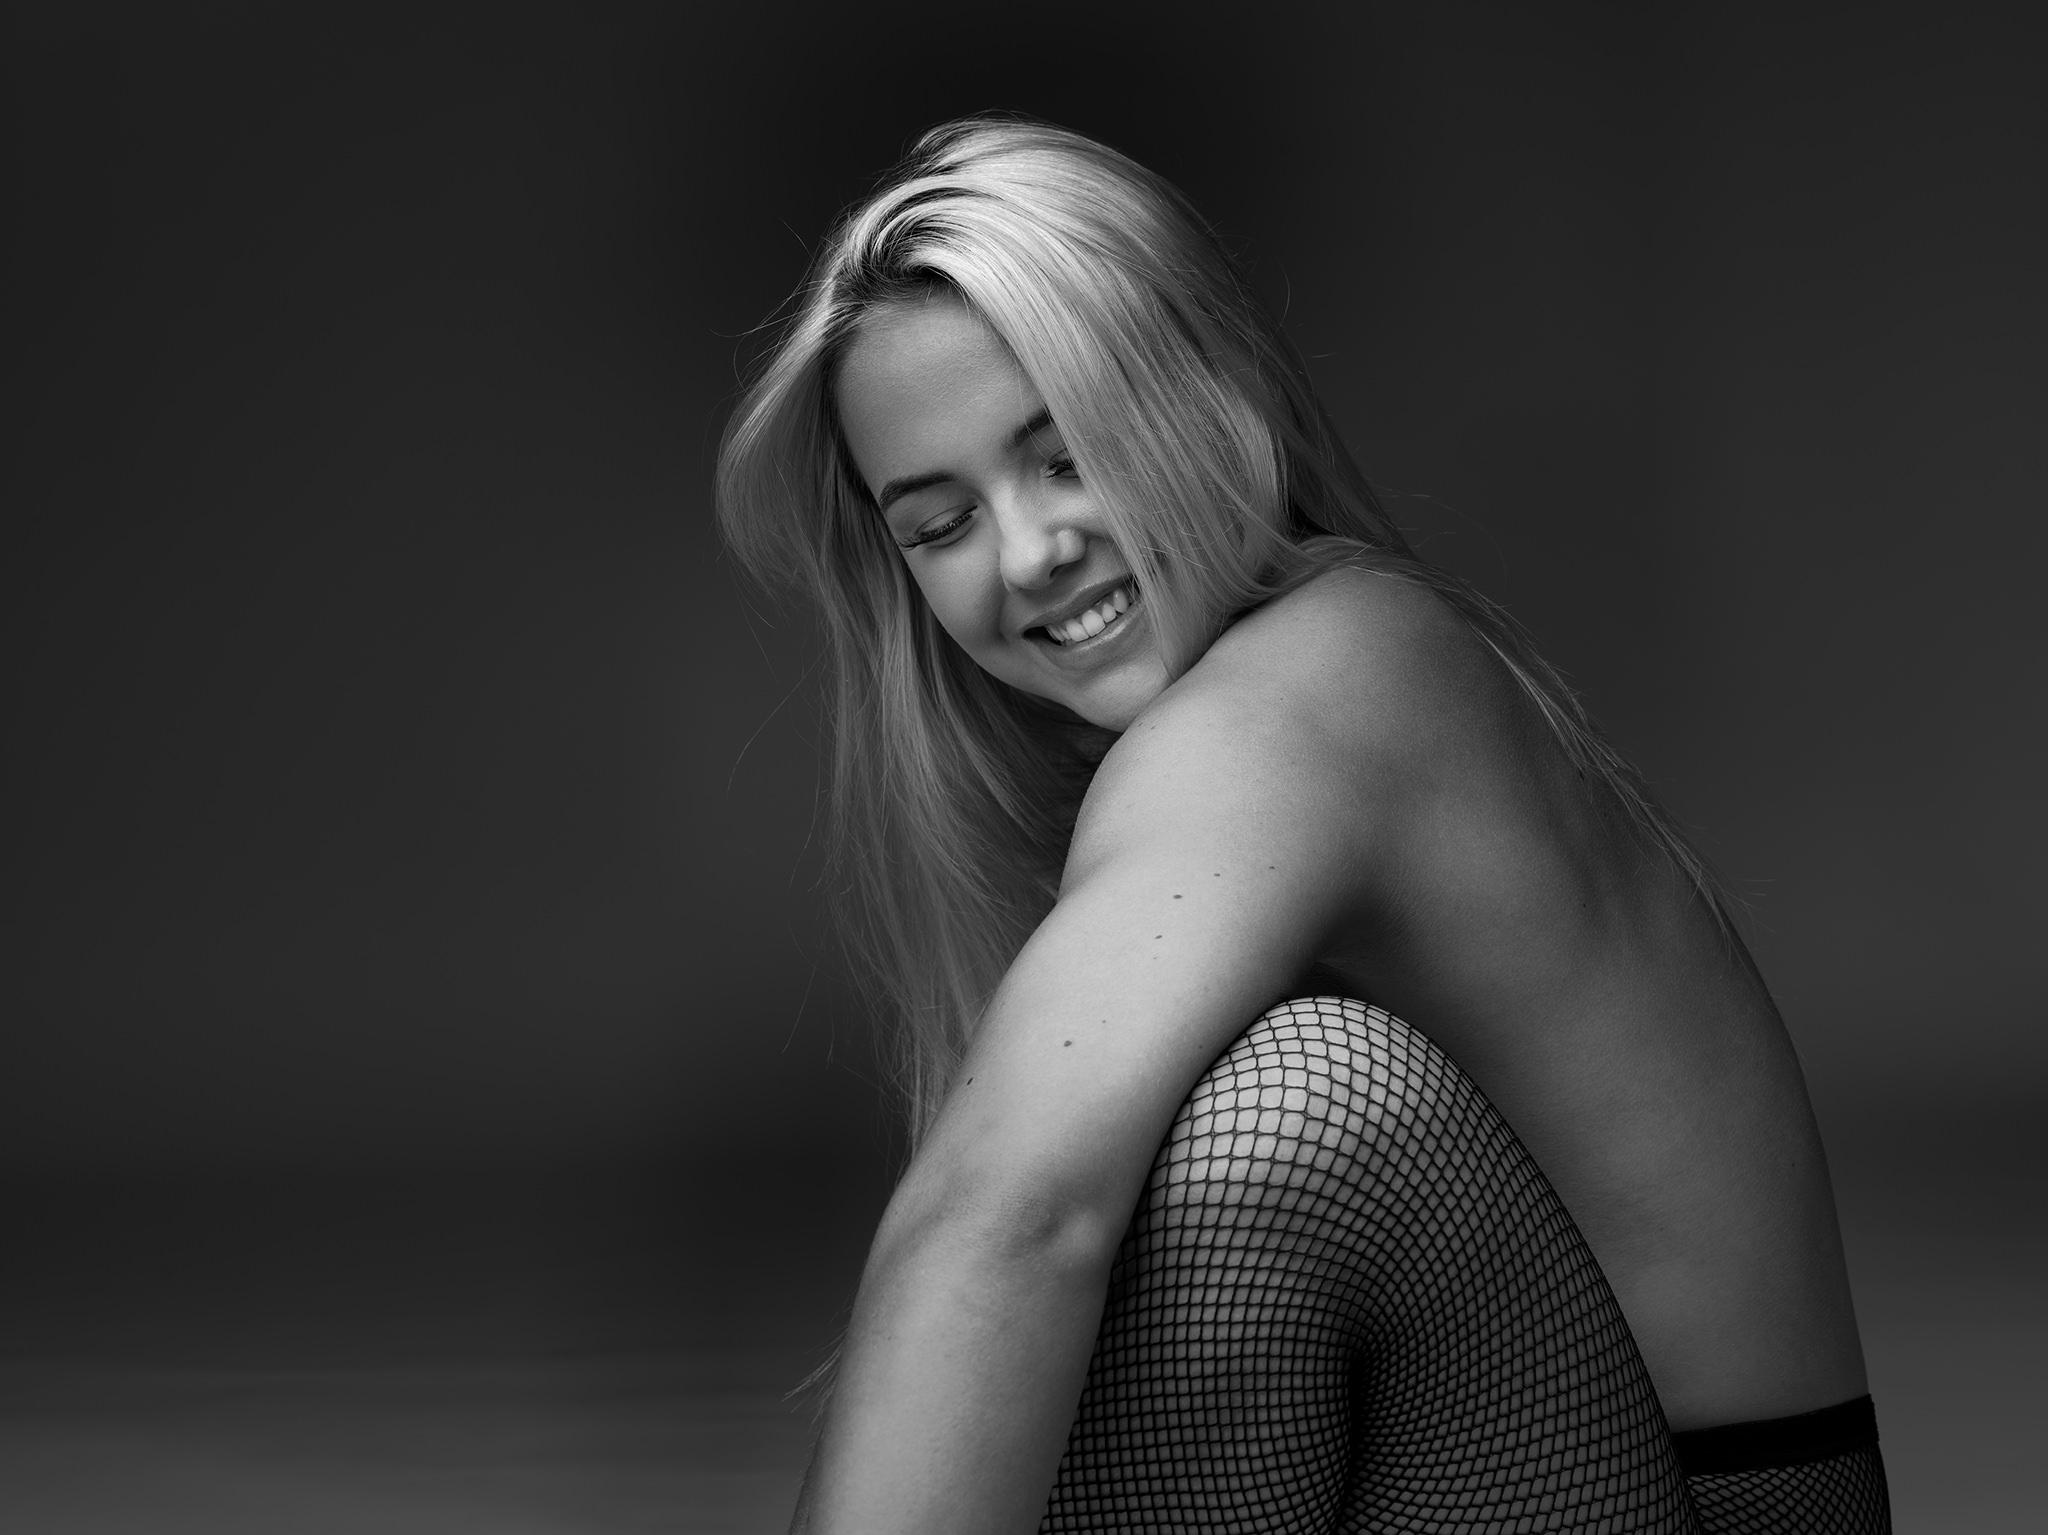 Hanne_0298_BW_2048px.jpg